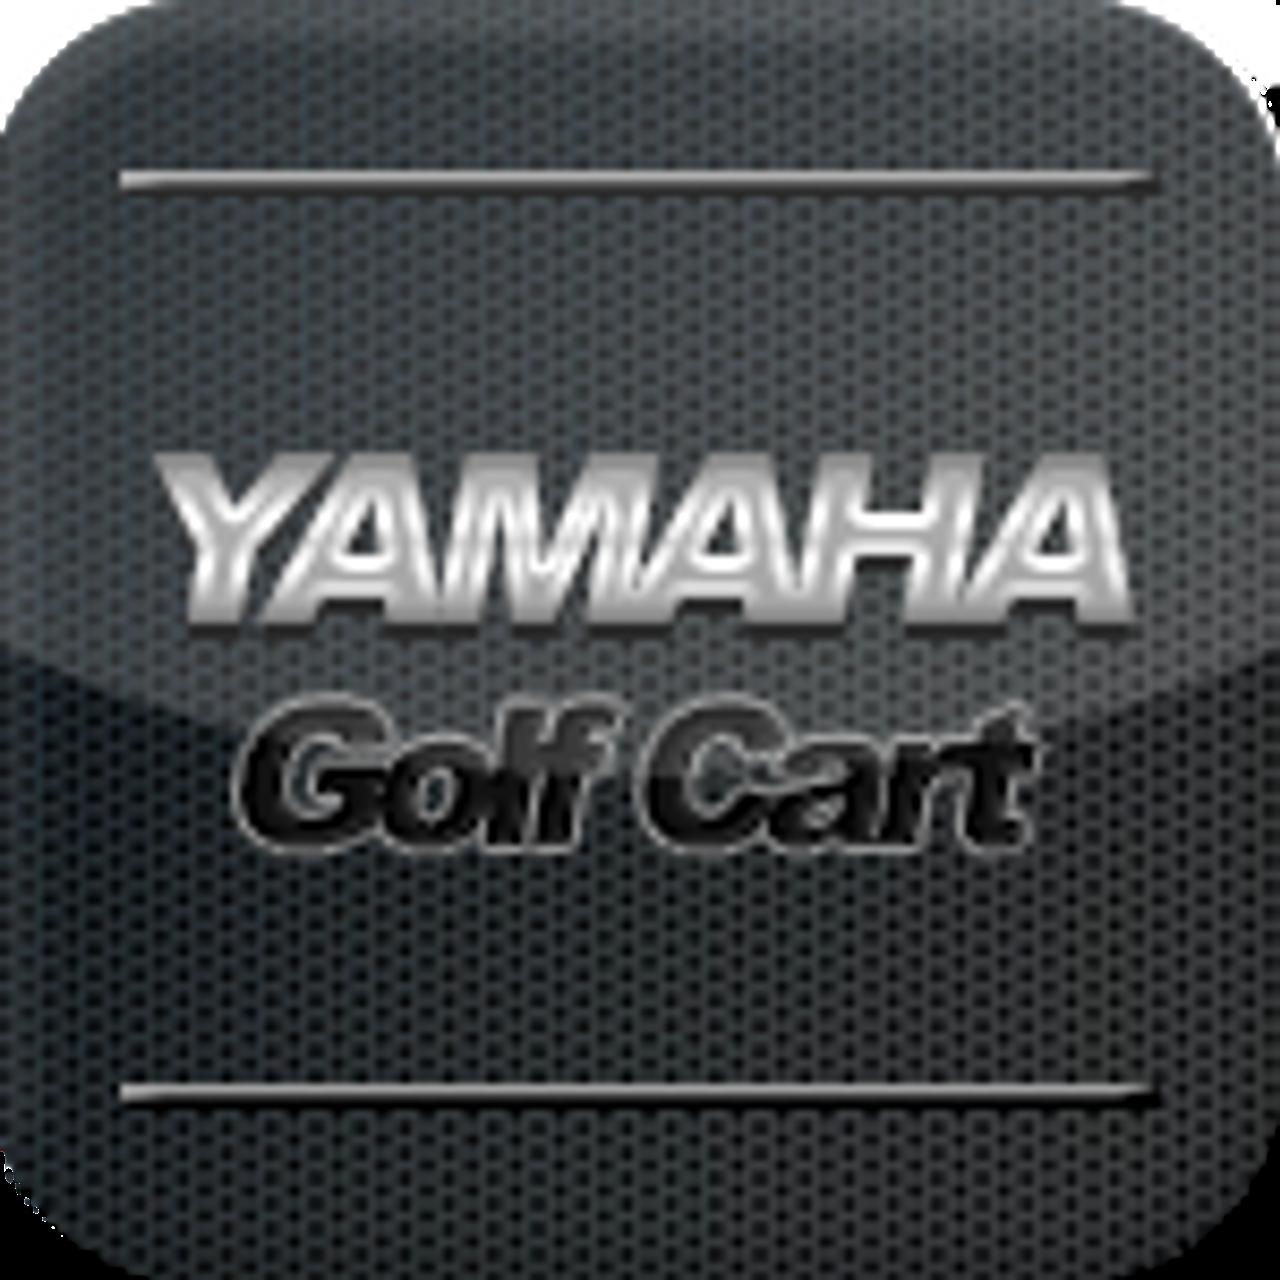 Yamaha Starter Generators